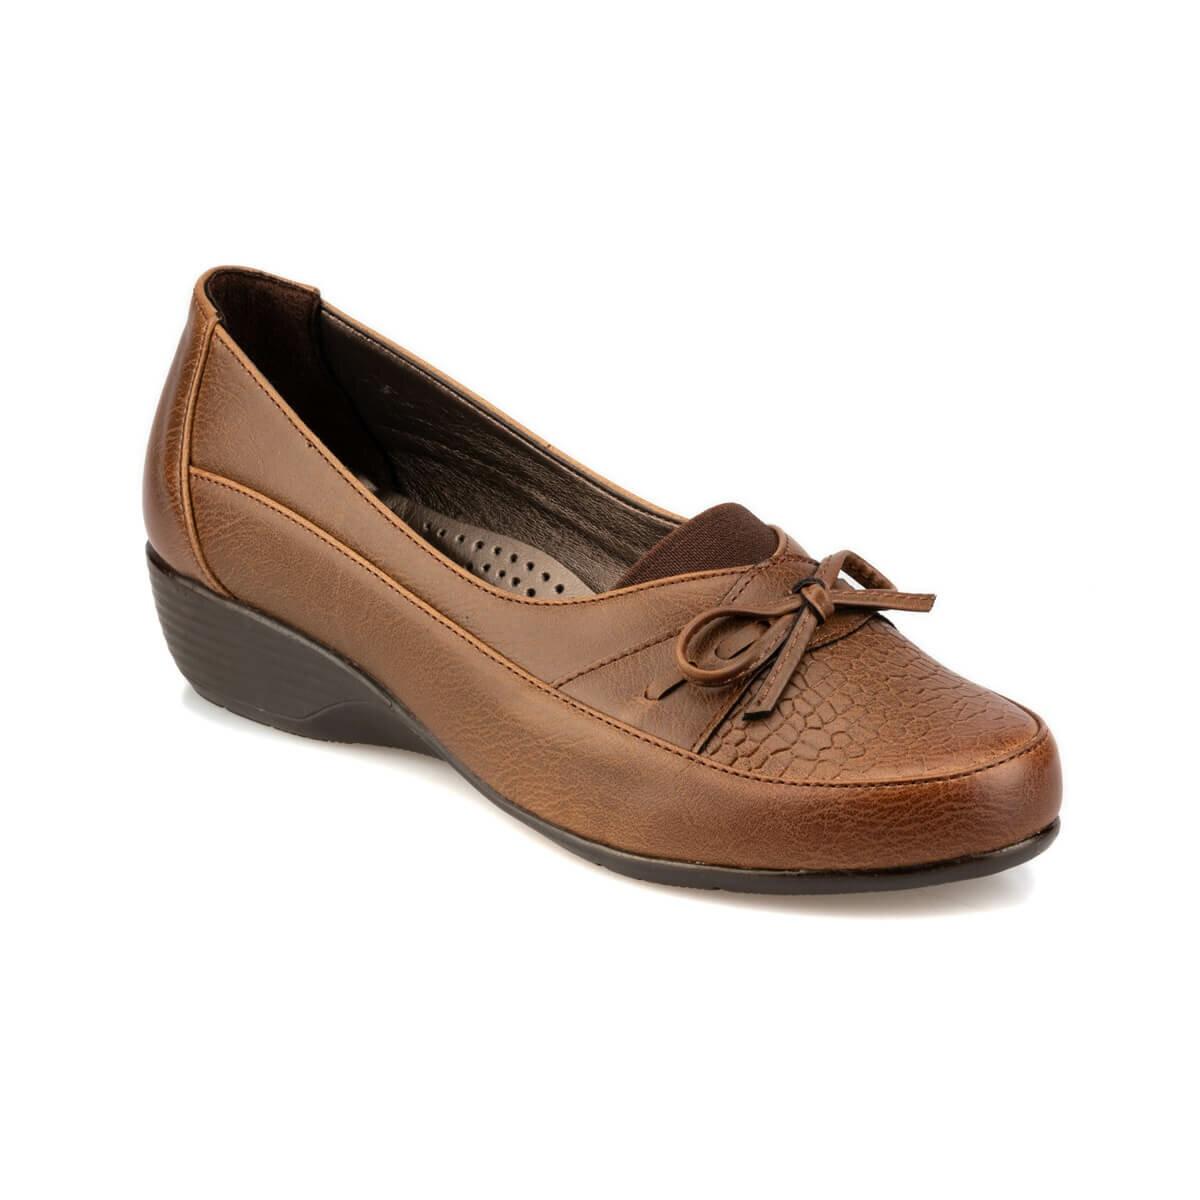 FLO 92.151019.Z Tan Women 'S Wedges Shoes Polaris